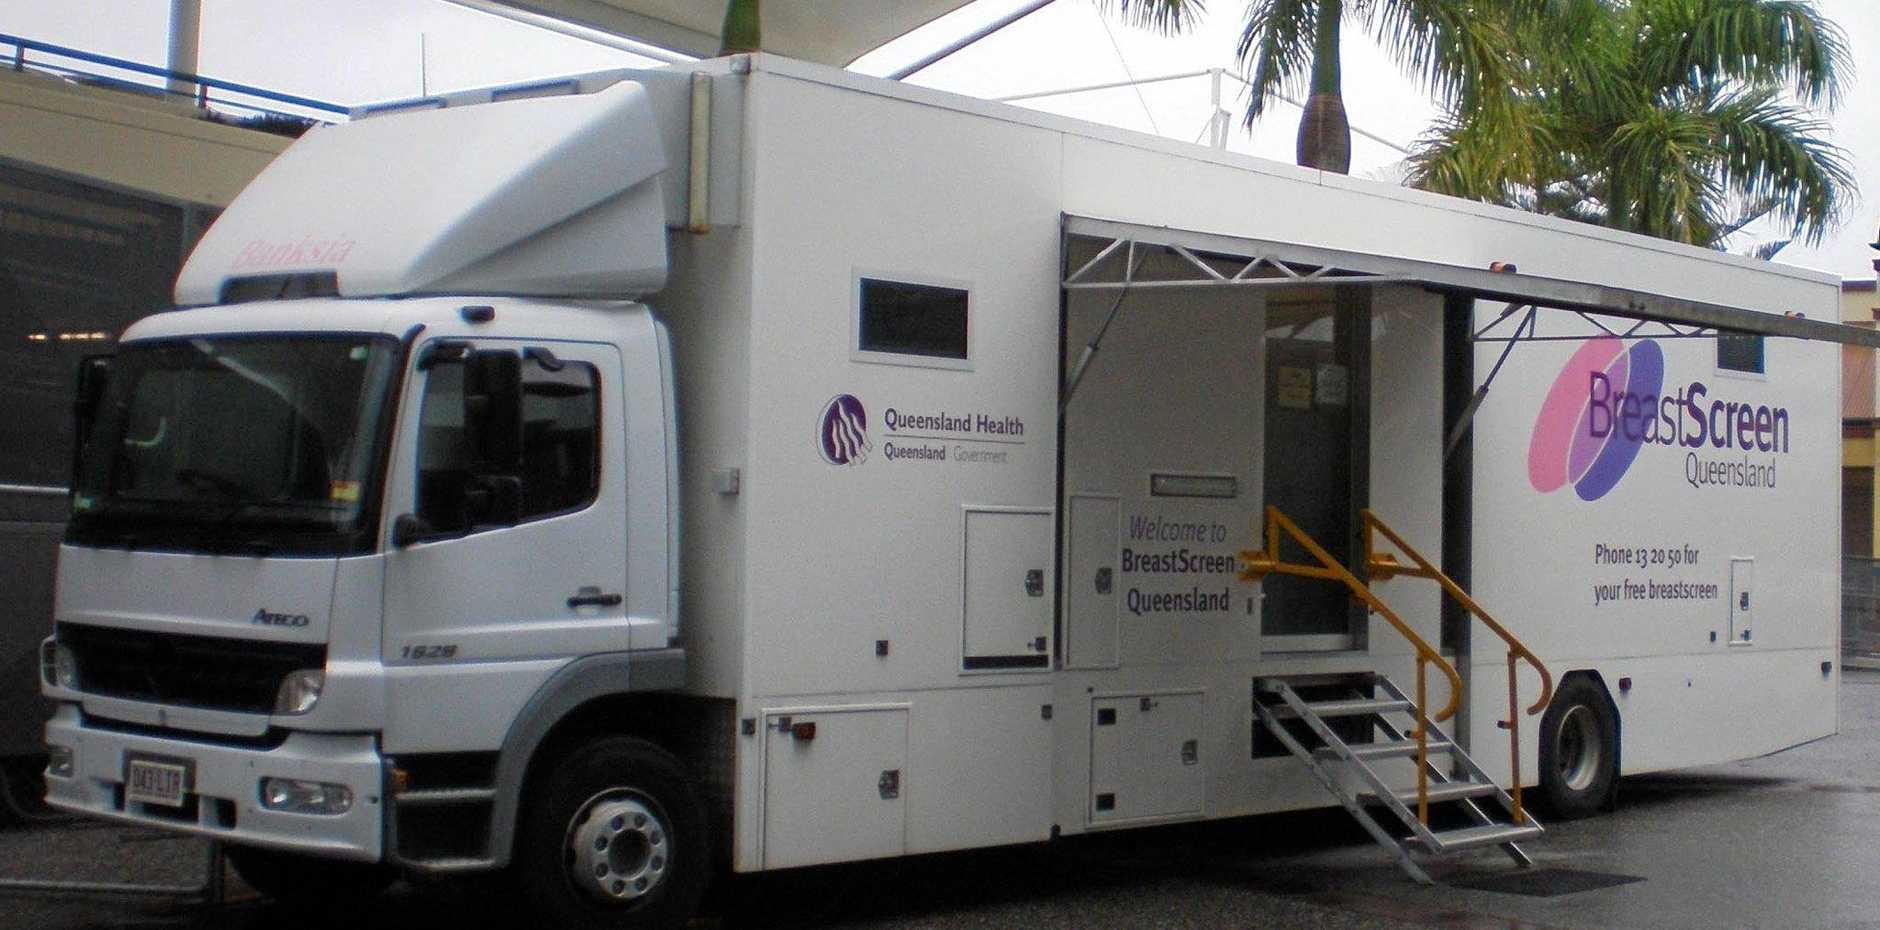 Take advantage of mobile BreastScreen service in Kingaroy, Nanango.